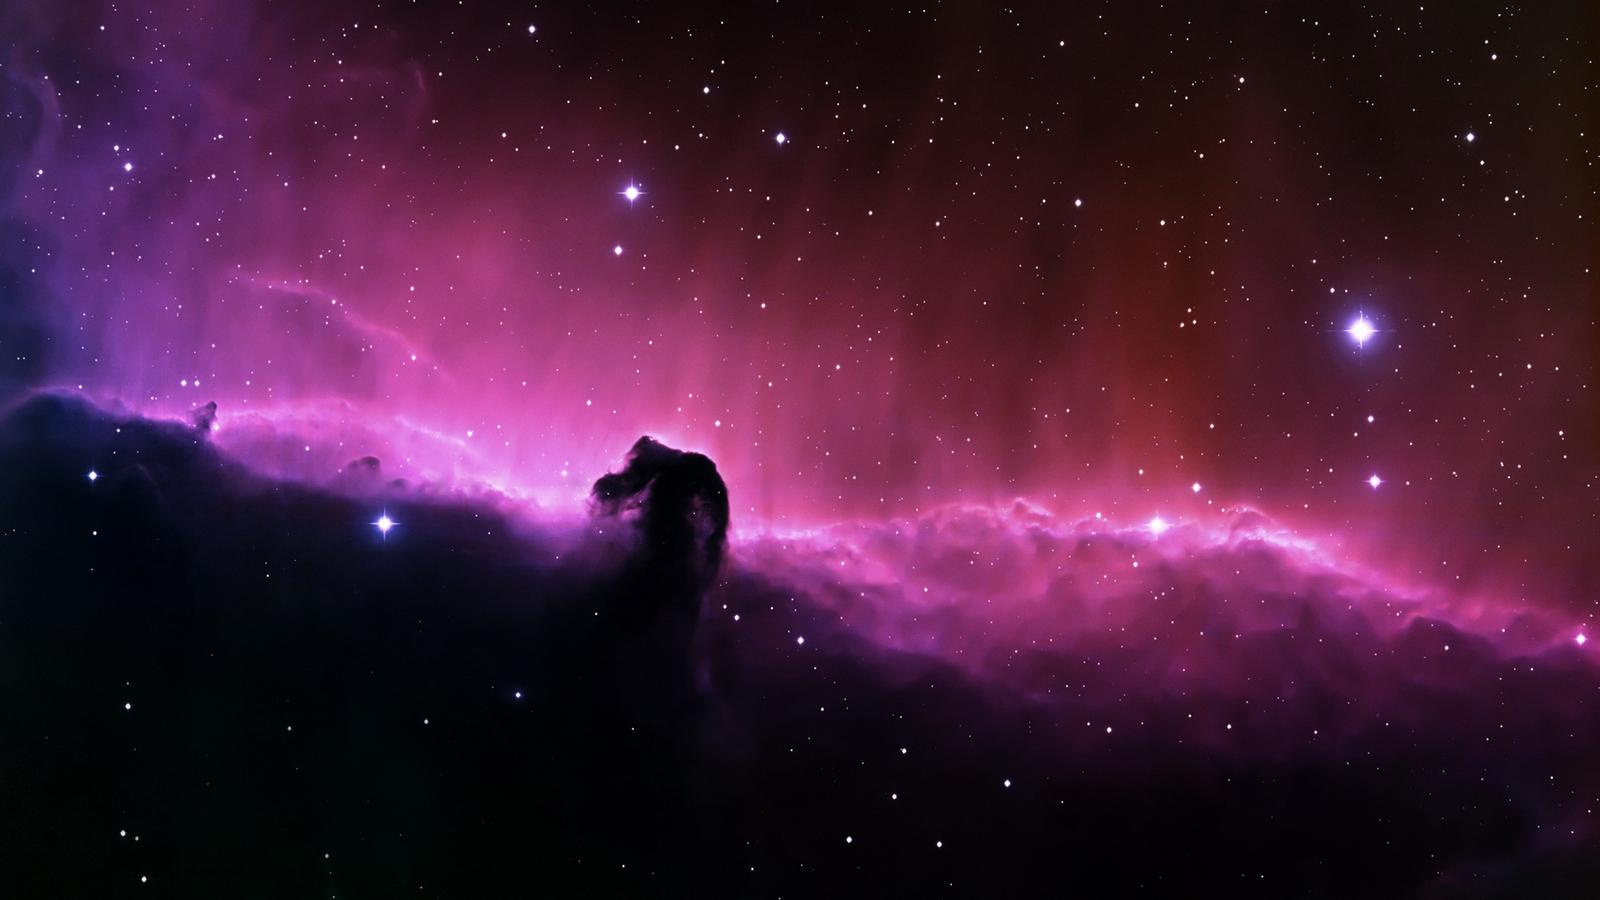 Purple nebula space desktop hd wallpaper Wallpaper Wallpapers 1600x900